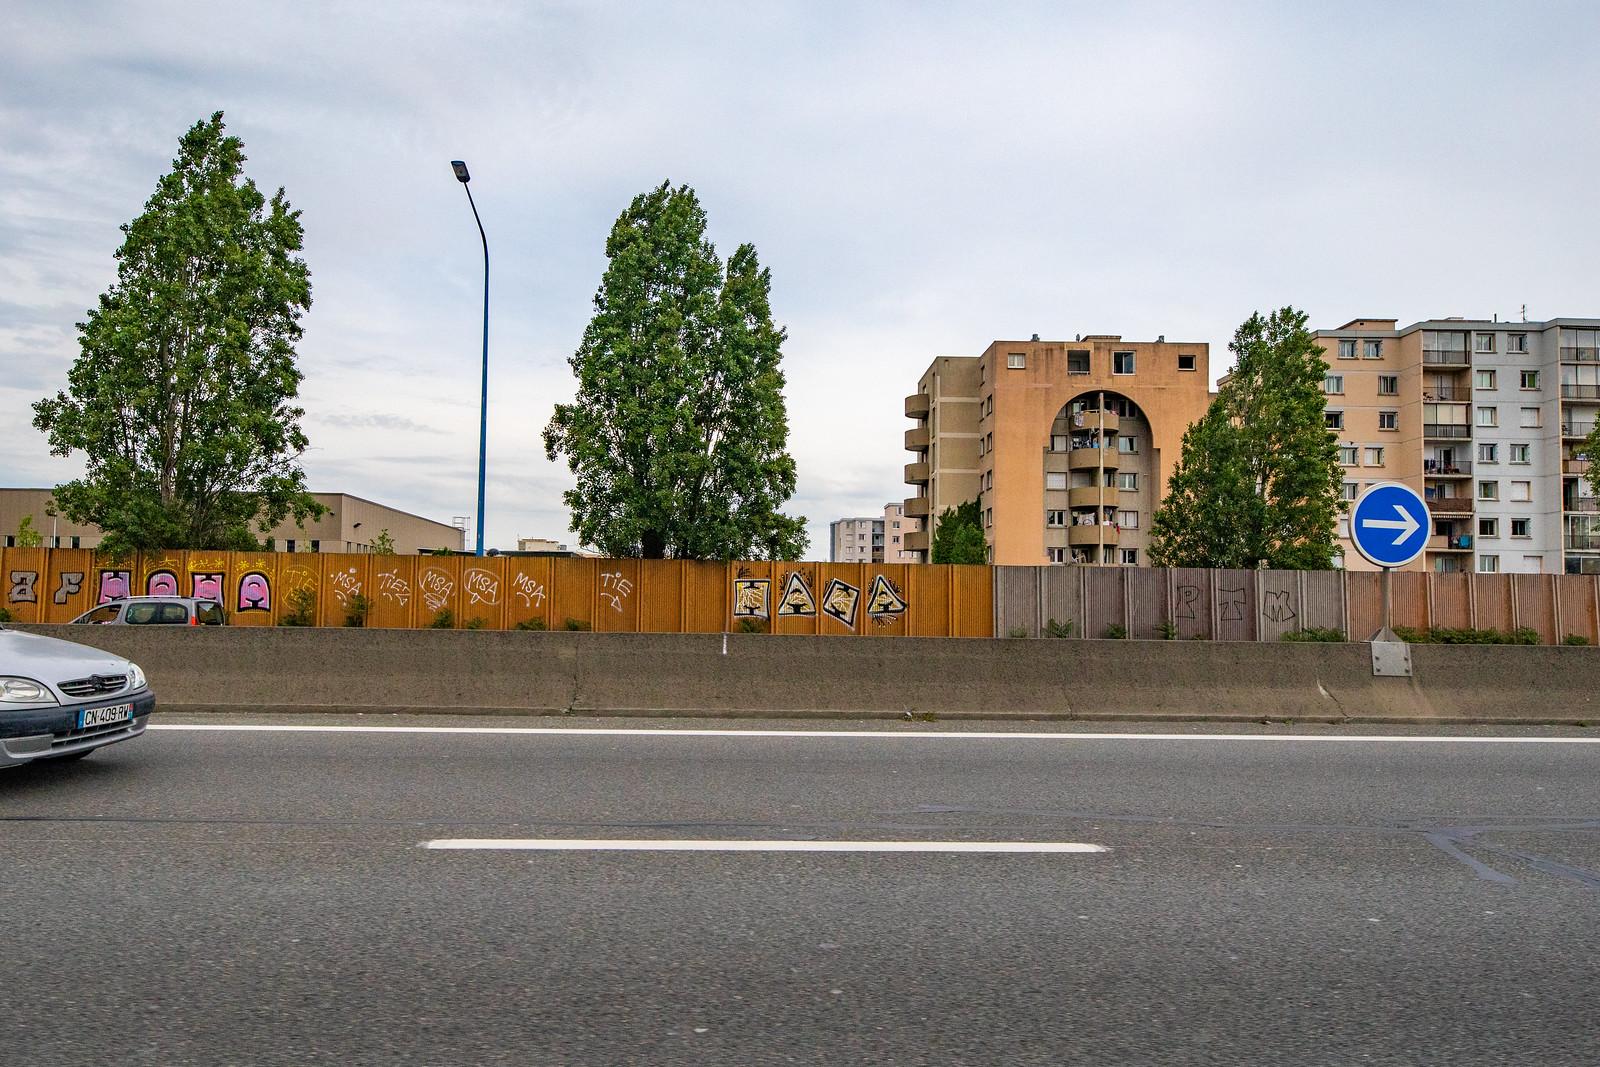 GRAFFITI STREET-ART TOULOUSE